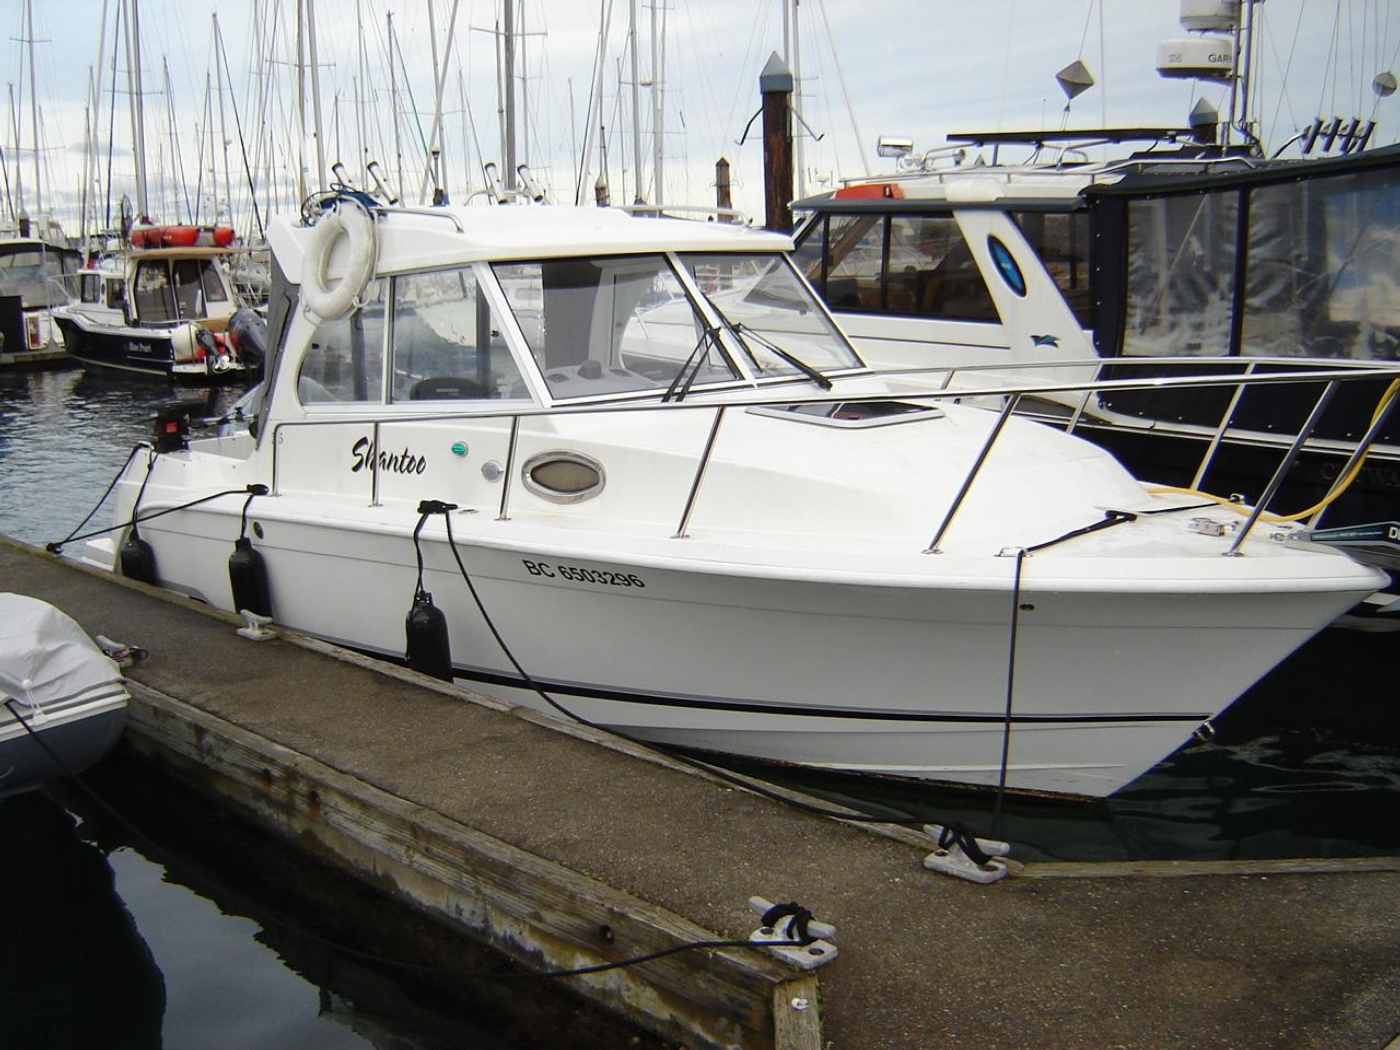 2019 Monaro 235 Sport, At the dock